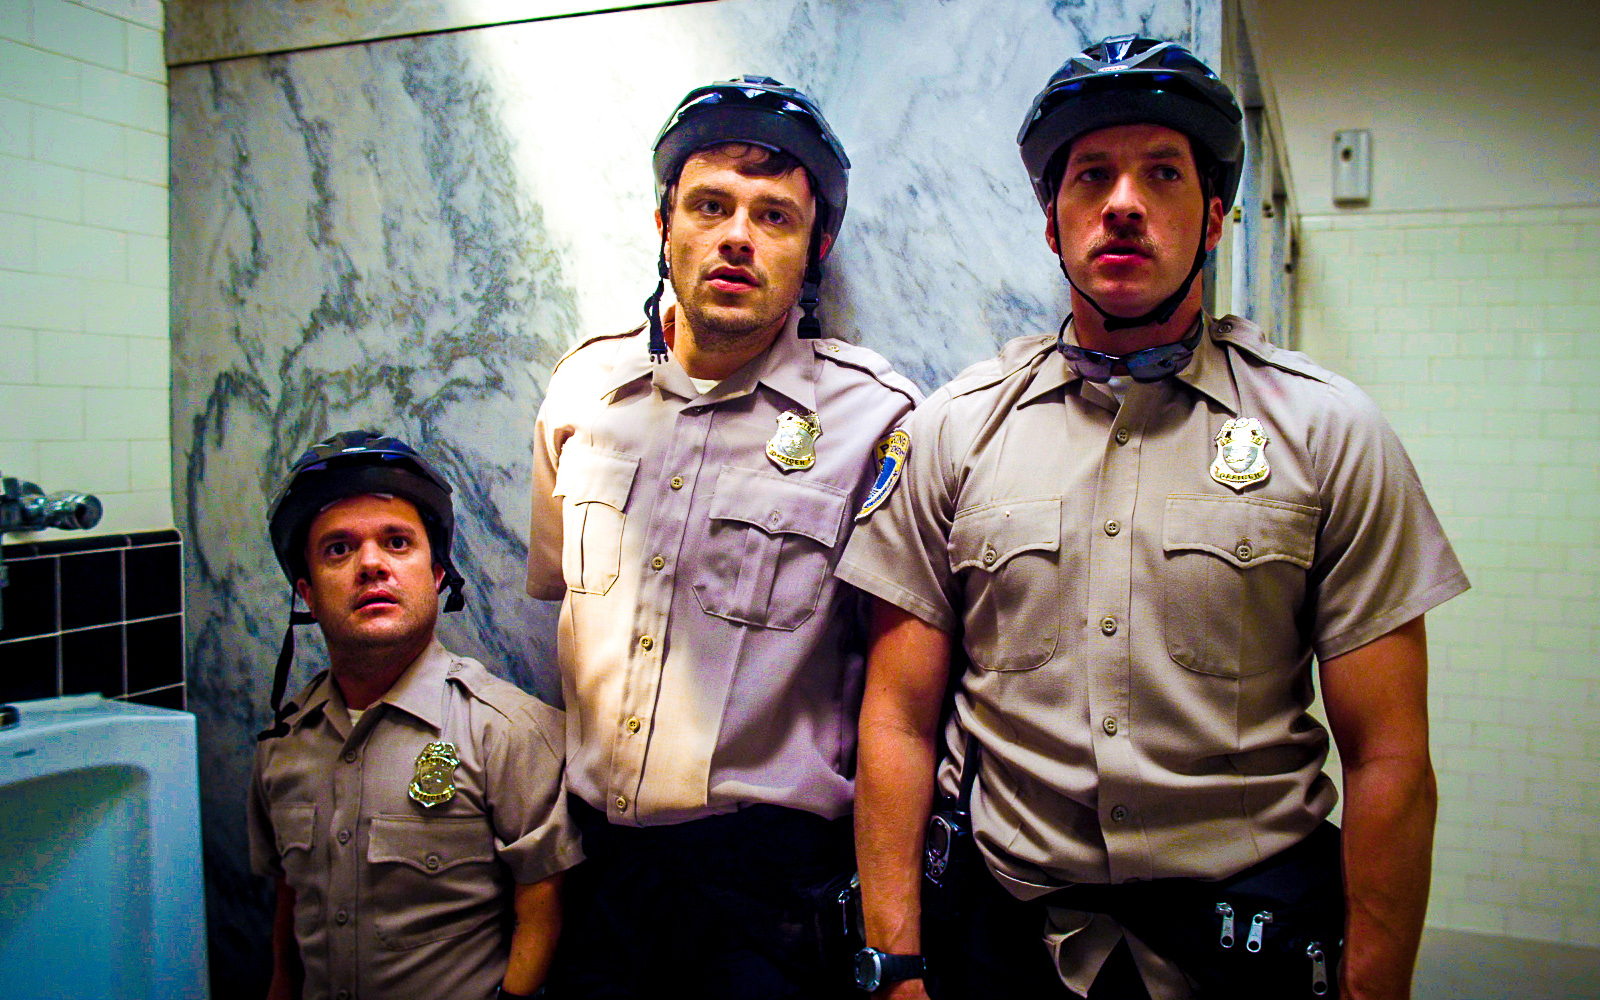 Ryan Hansen, Pancho Moler, and David Barton Harris in Friended to Death (2014)